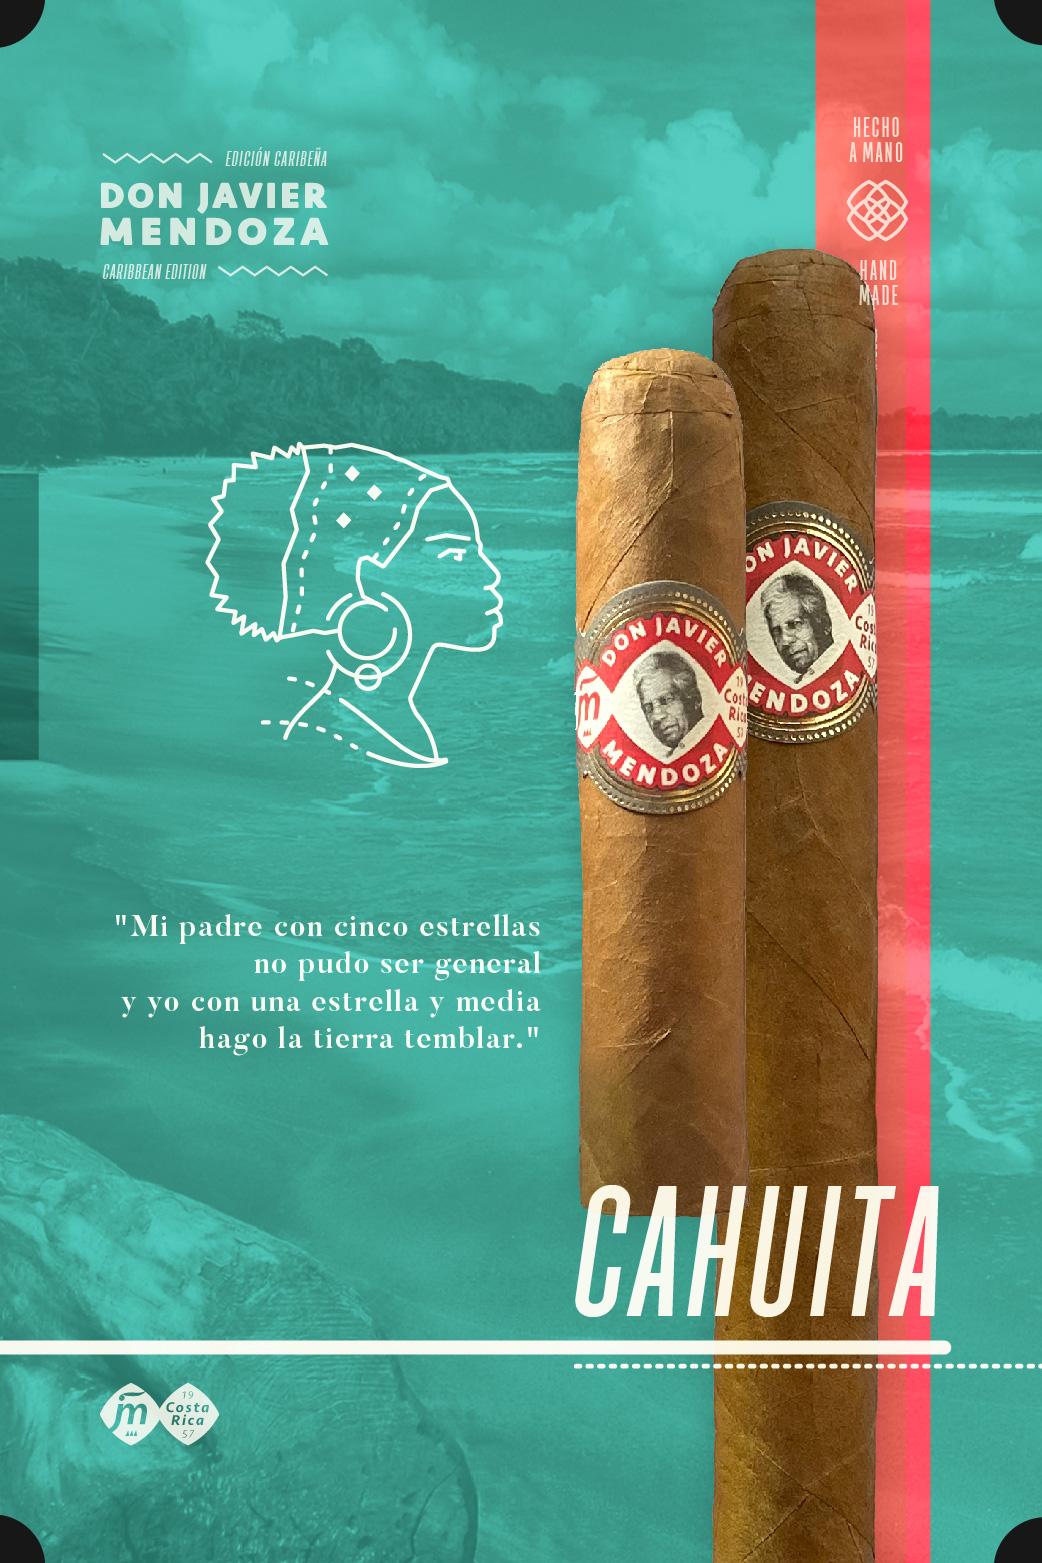 Don Javier Mendoza Cahuita